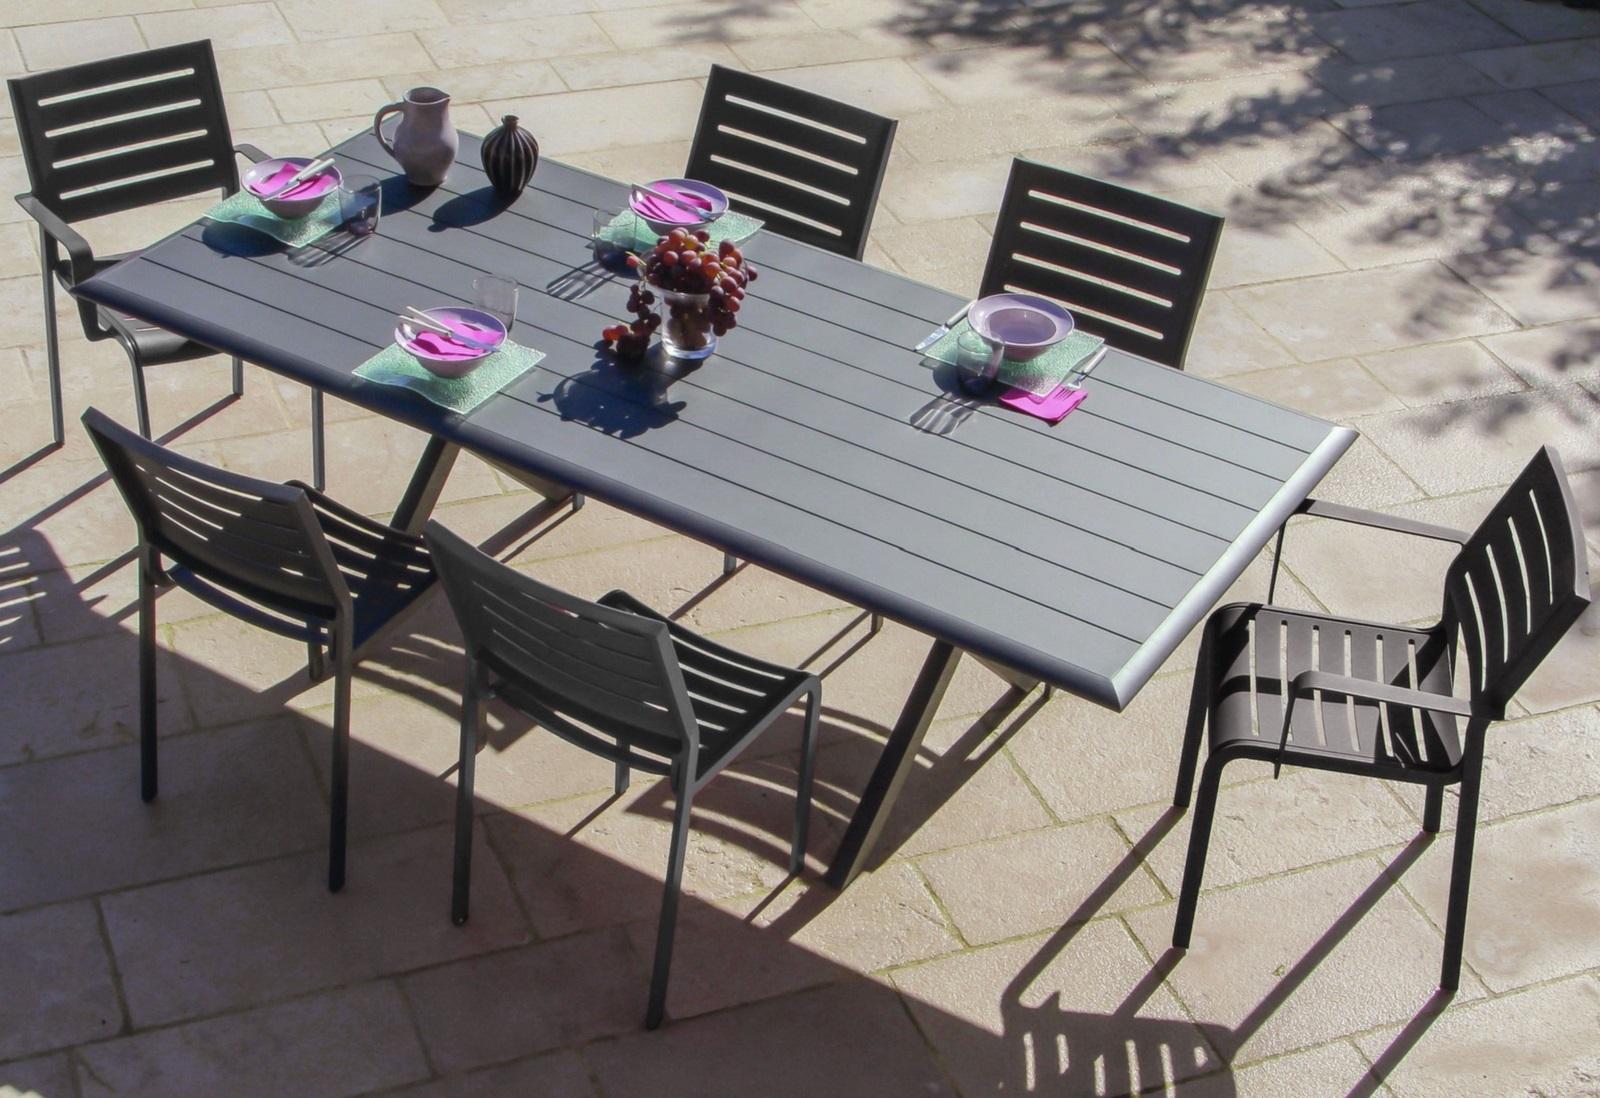 Salon De Jardin Leger salon de jardin en aluminium : un matériau fait pour l